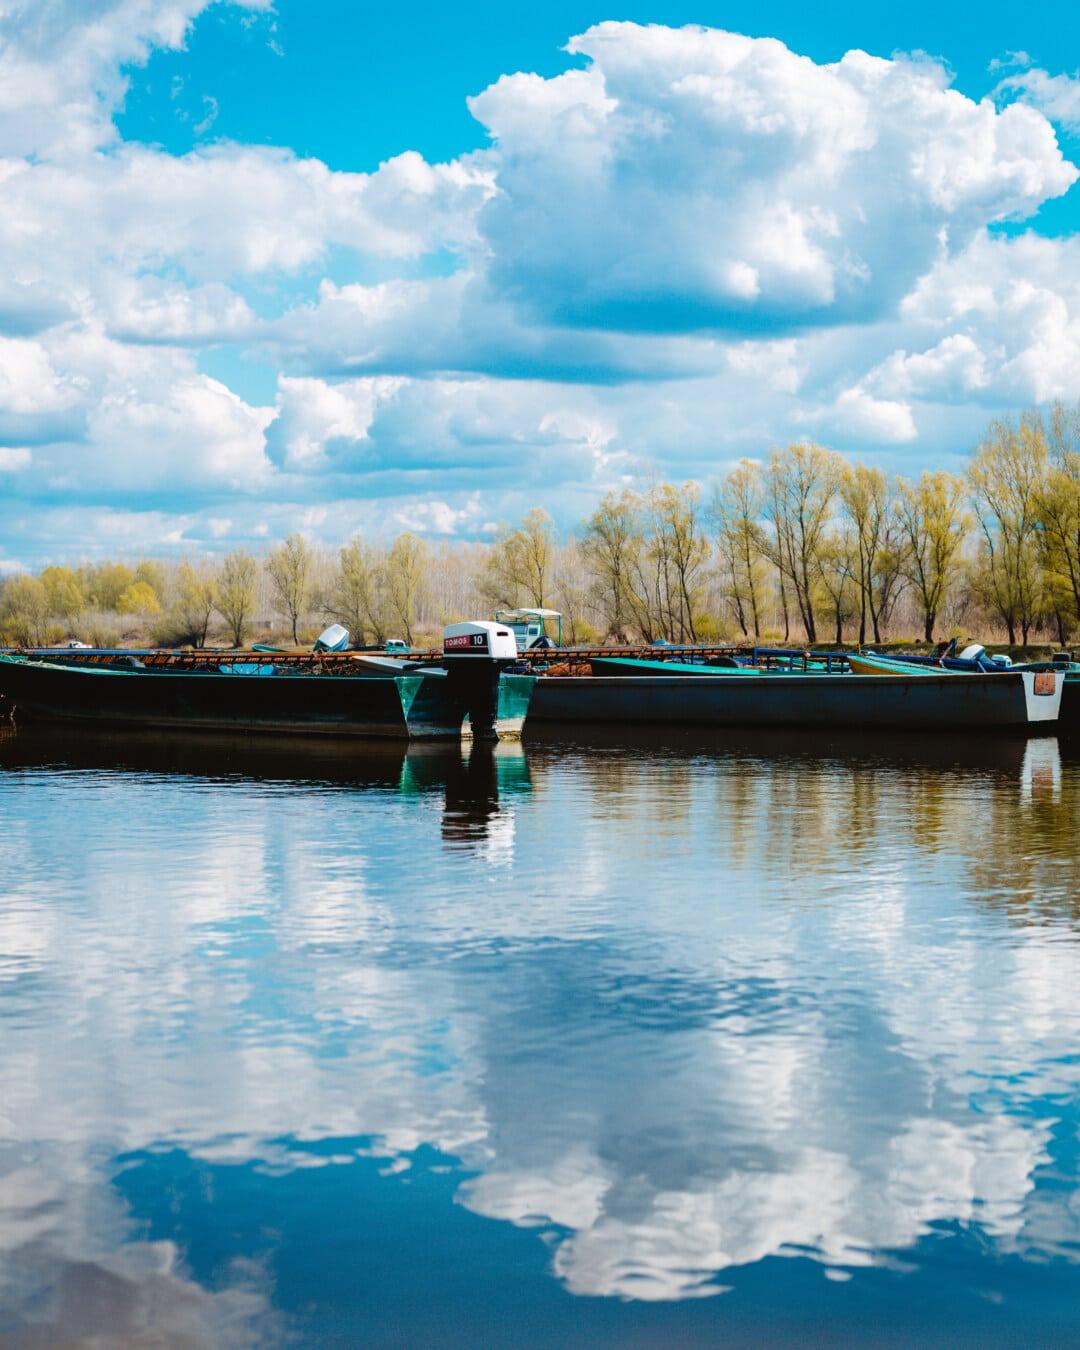 Boote, Flussschiff, Angelboot/Fischerboot, Wasser, Landschaft, See, Boot, Sommer, Fluss, Natur